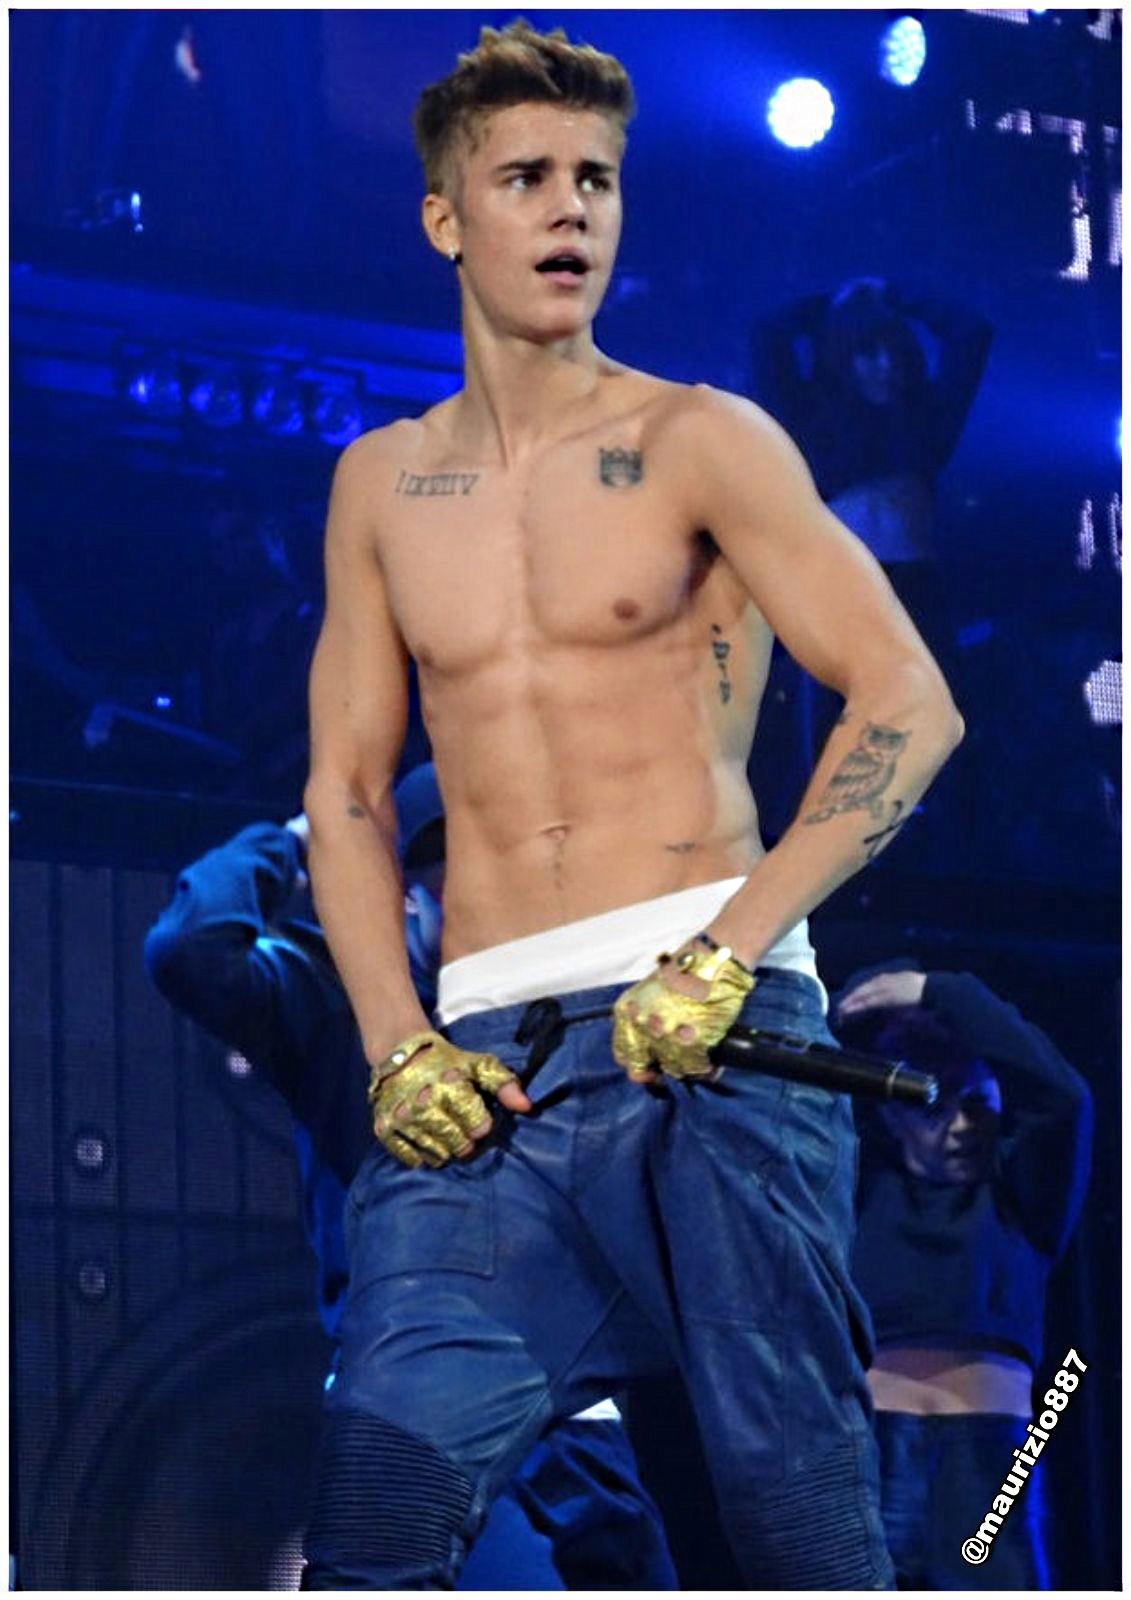 Justin Bieber justin bieber, 2013